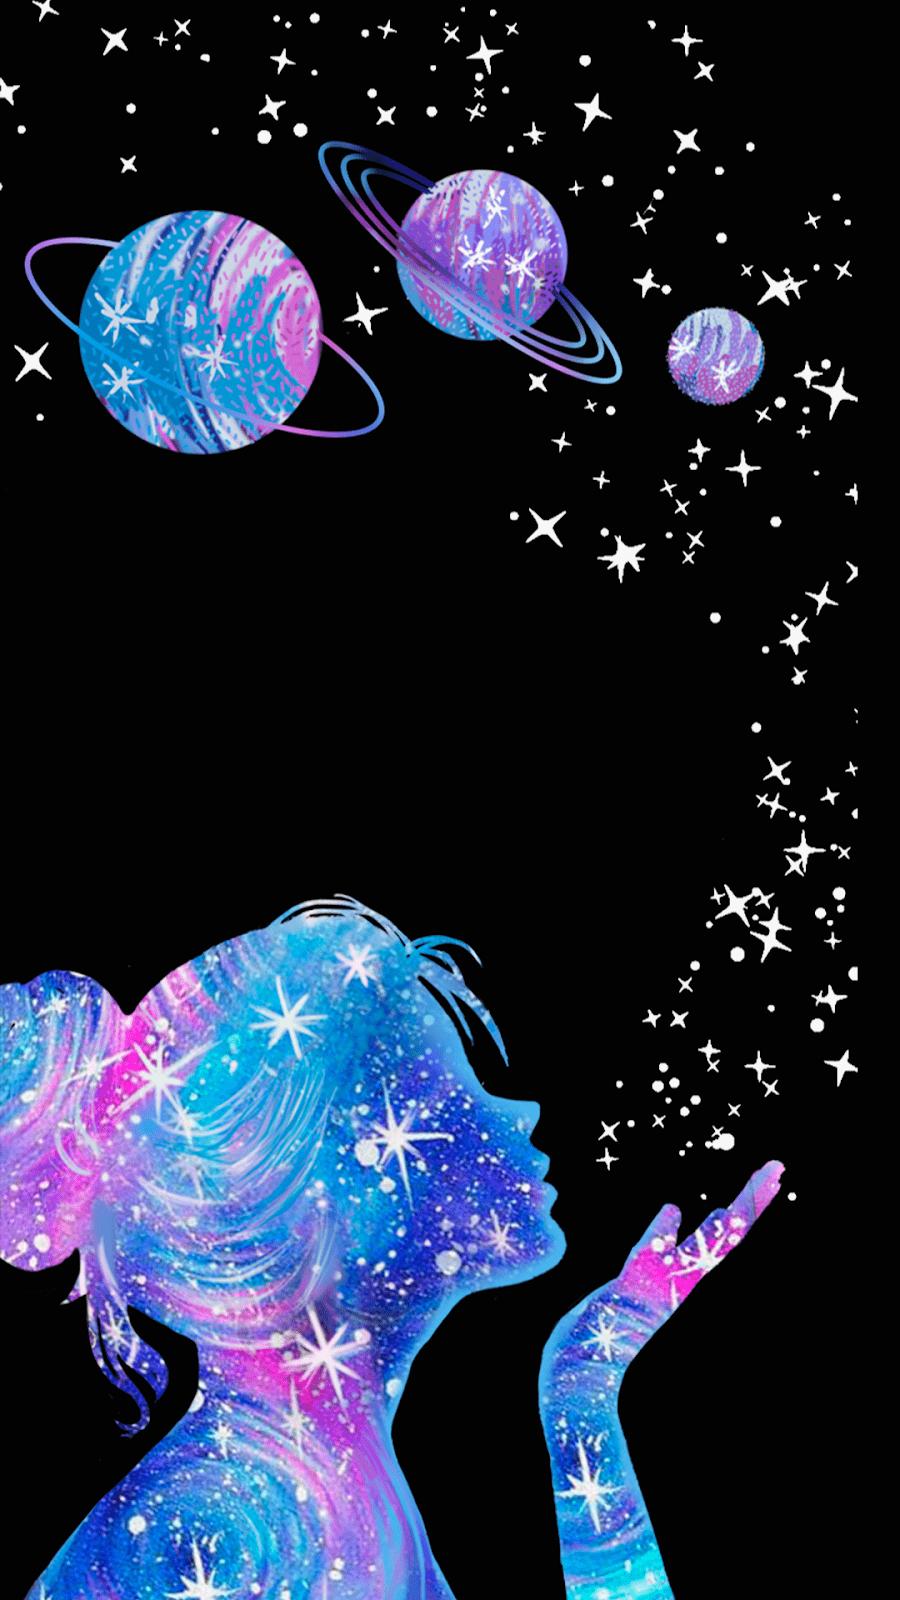 Glitter Girly Galaxy Wallpaper : glitter, girly, galaxy, wallpaper, Glitter, Galaxy, Wallpapers, Backgrounds, WallpaperAccess